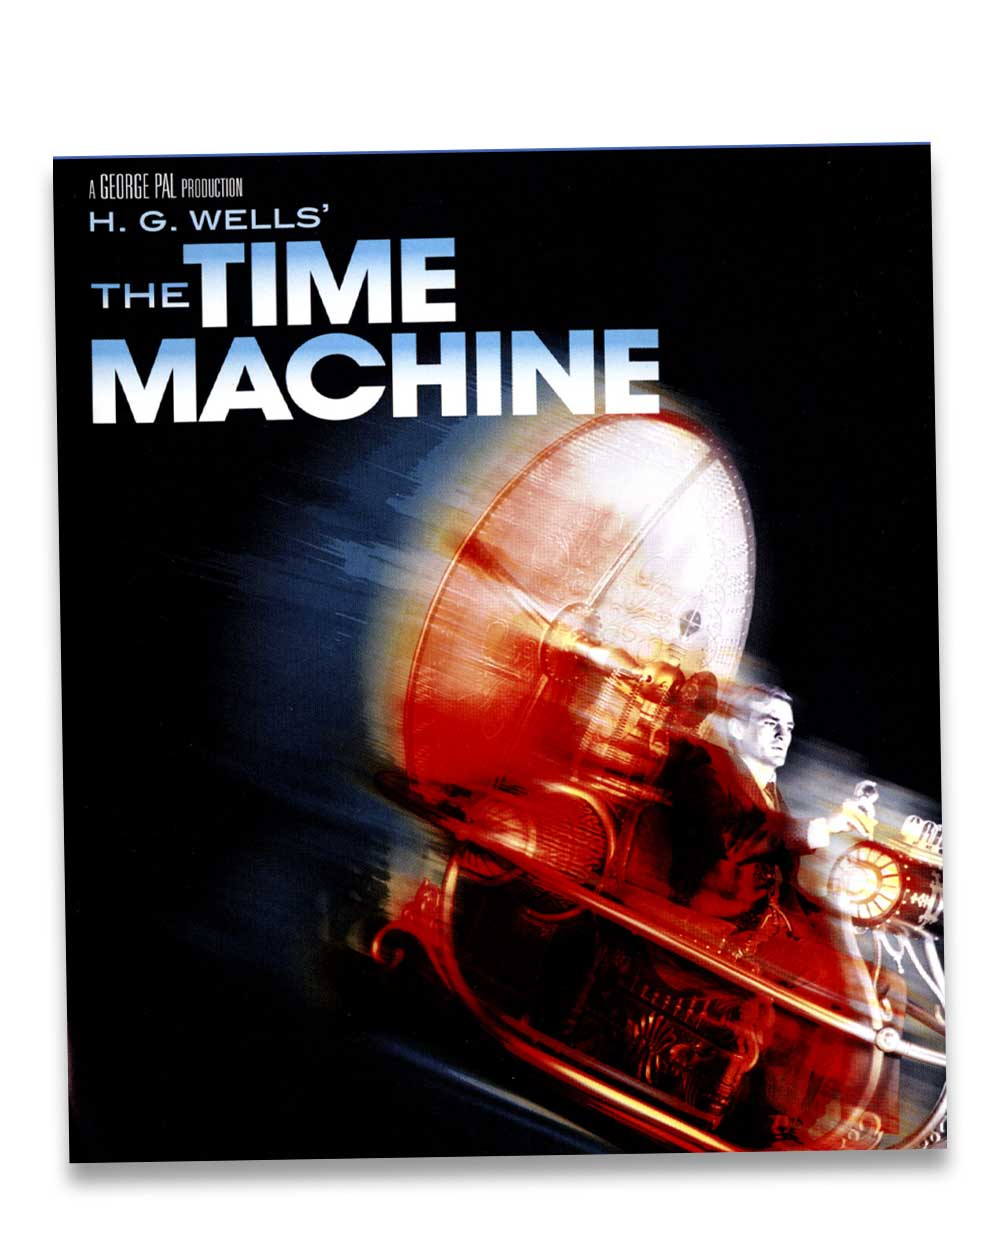 The Time Machine, 1960, retro futurism